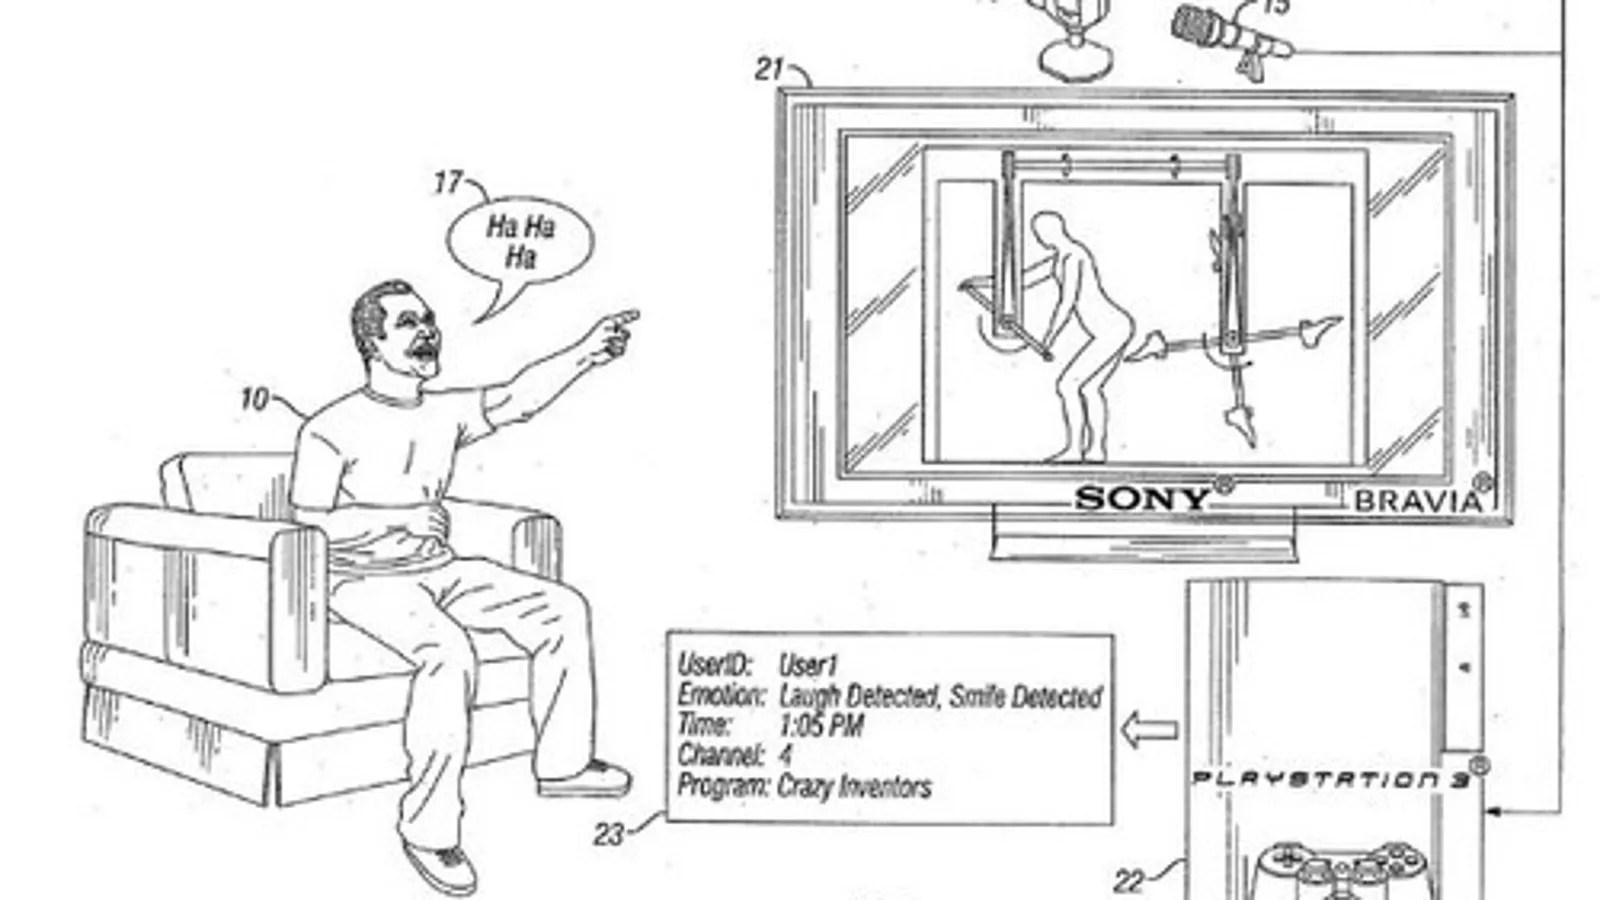 Sony PS3 Laugh Detector Patent Has Very Juvenile Sense of